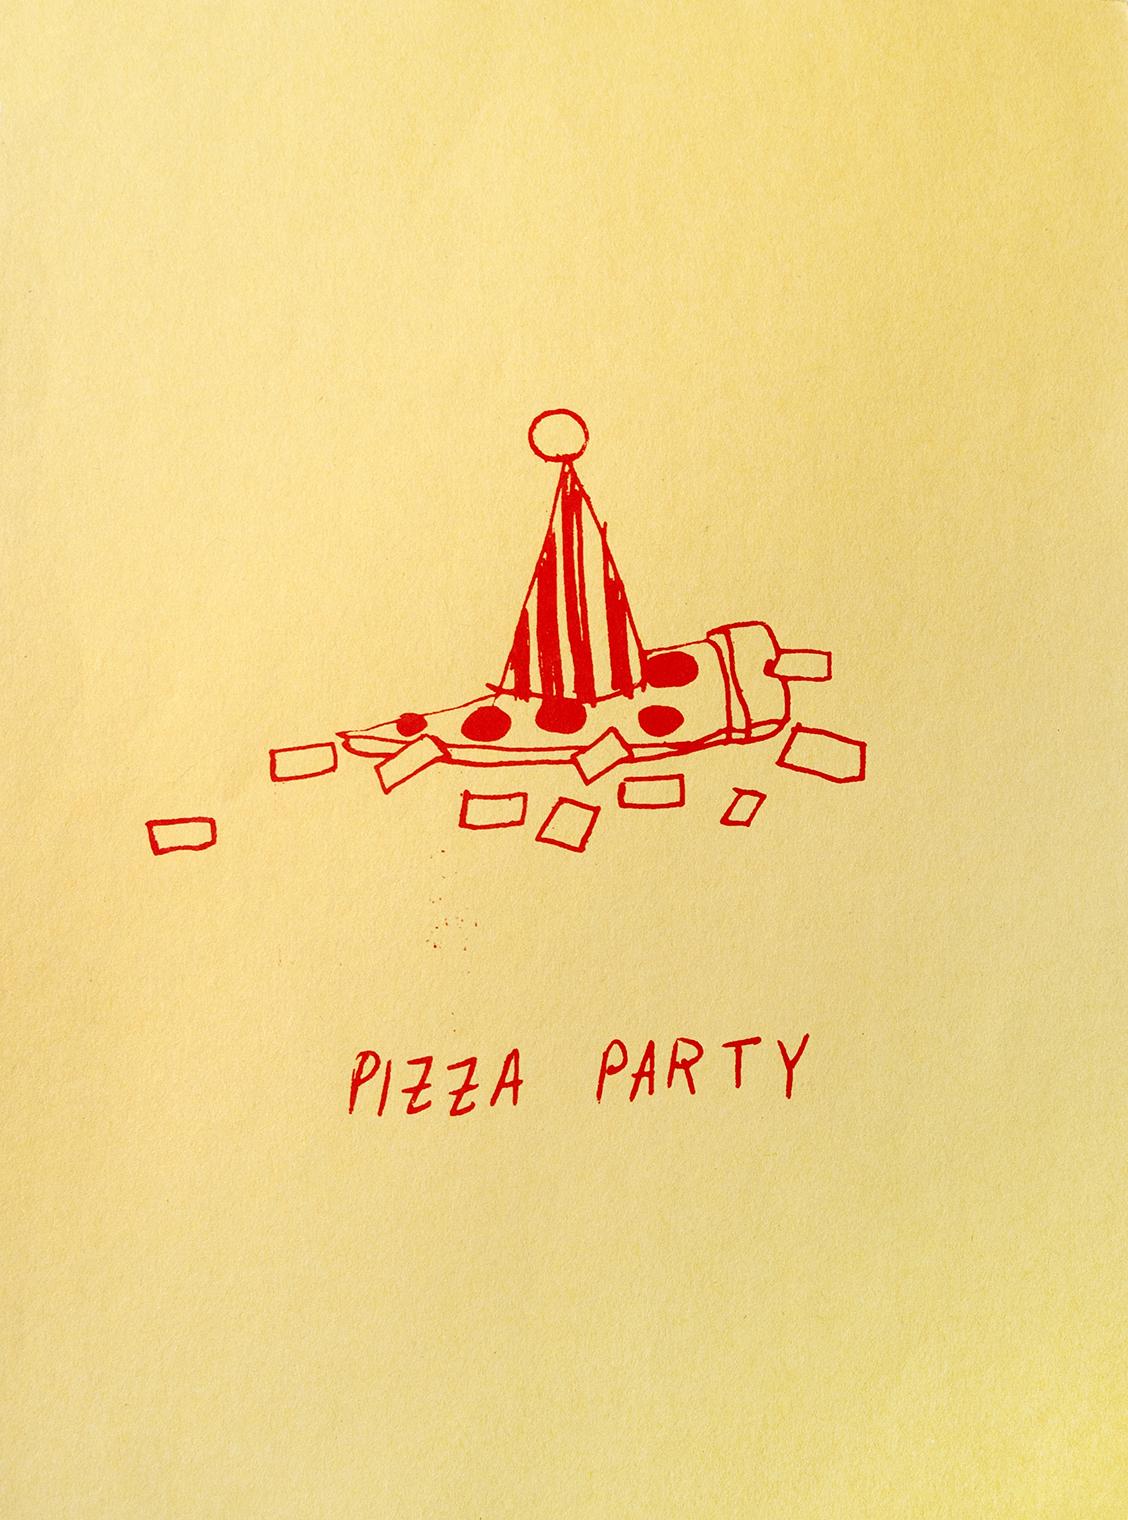 finalpizza.jpg